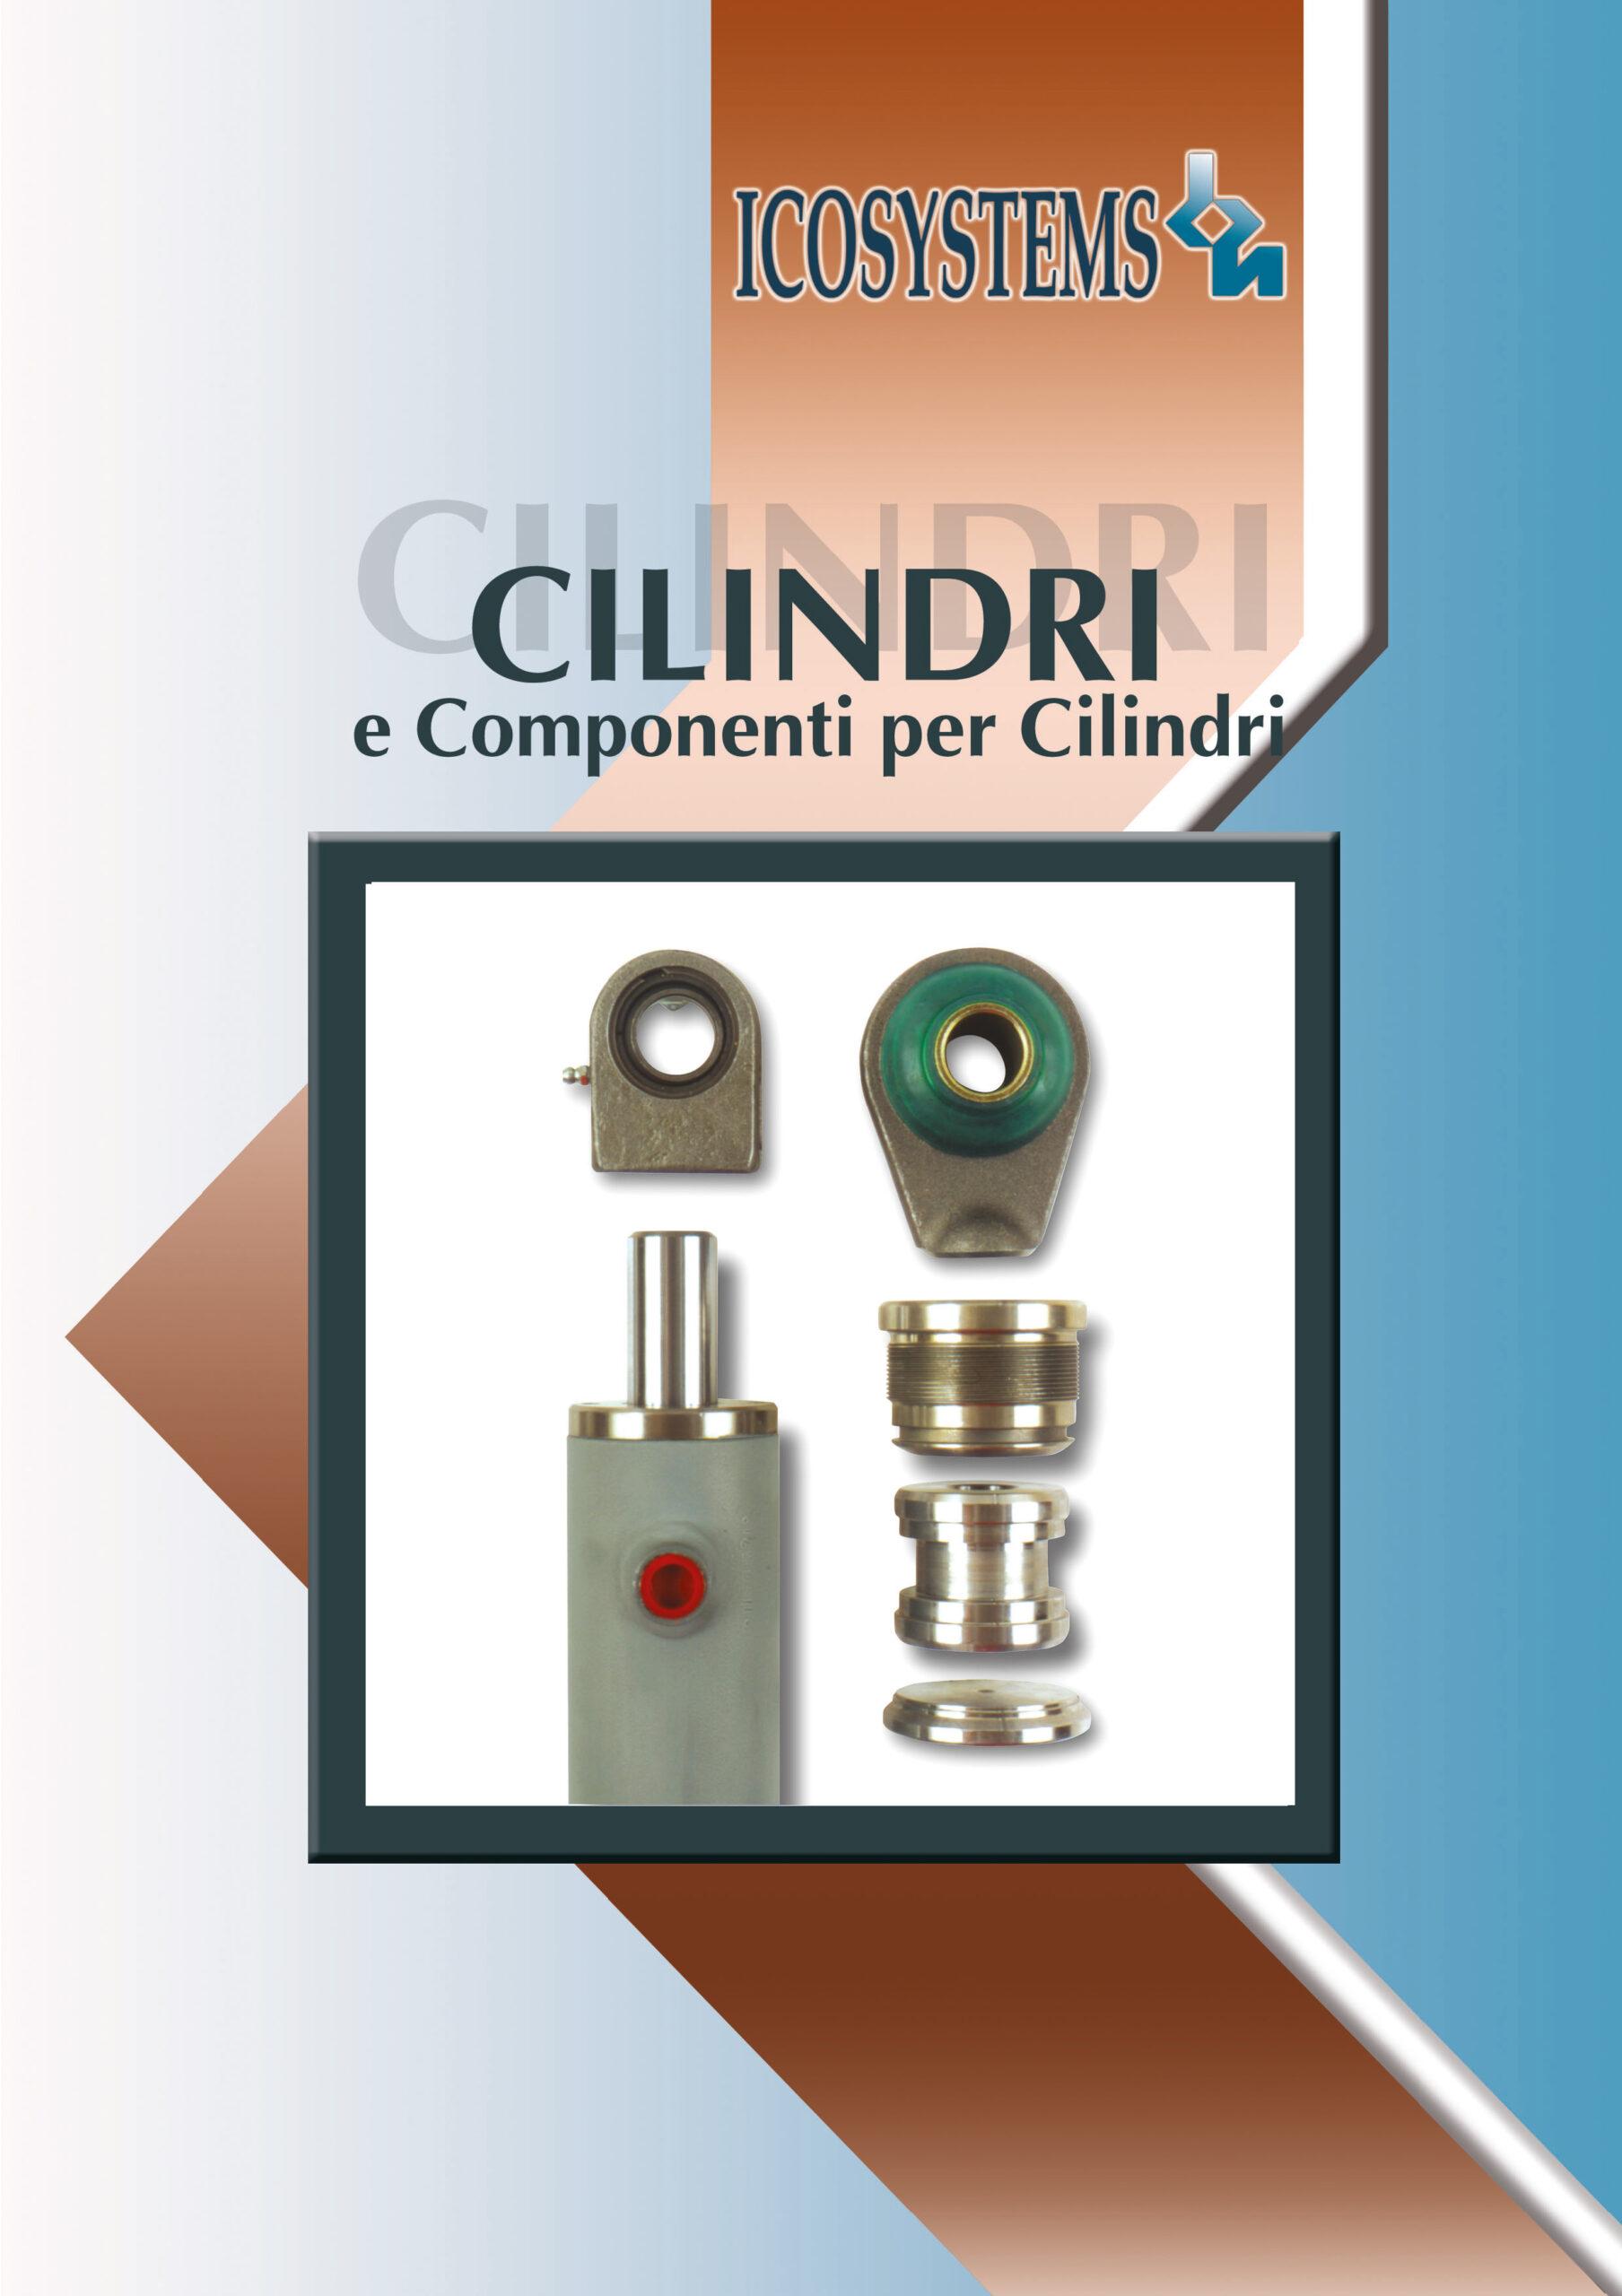 cilindri oleodinamici icosystems